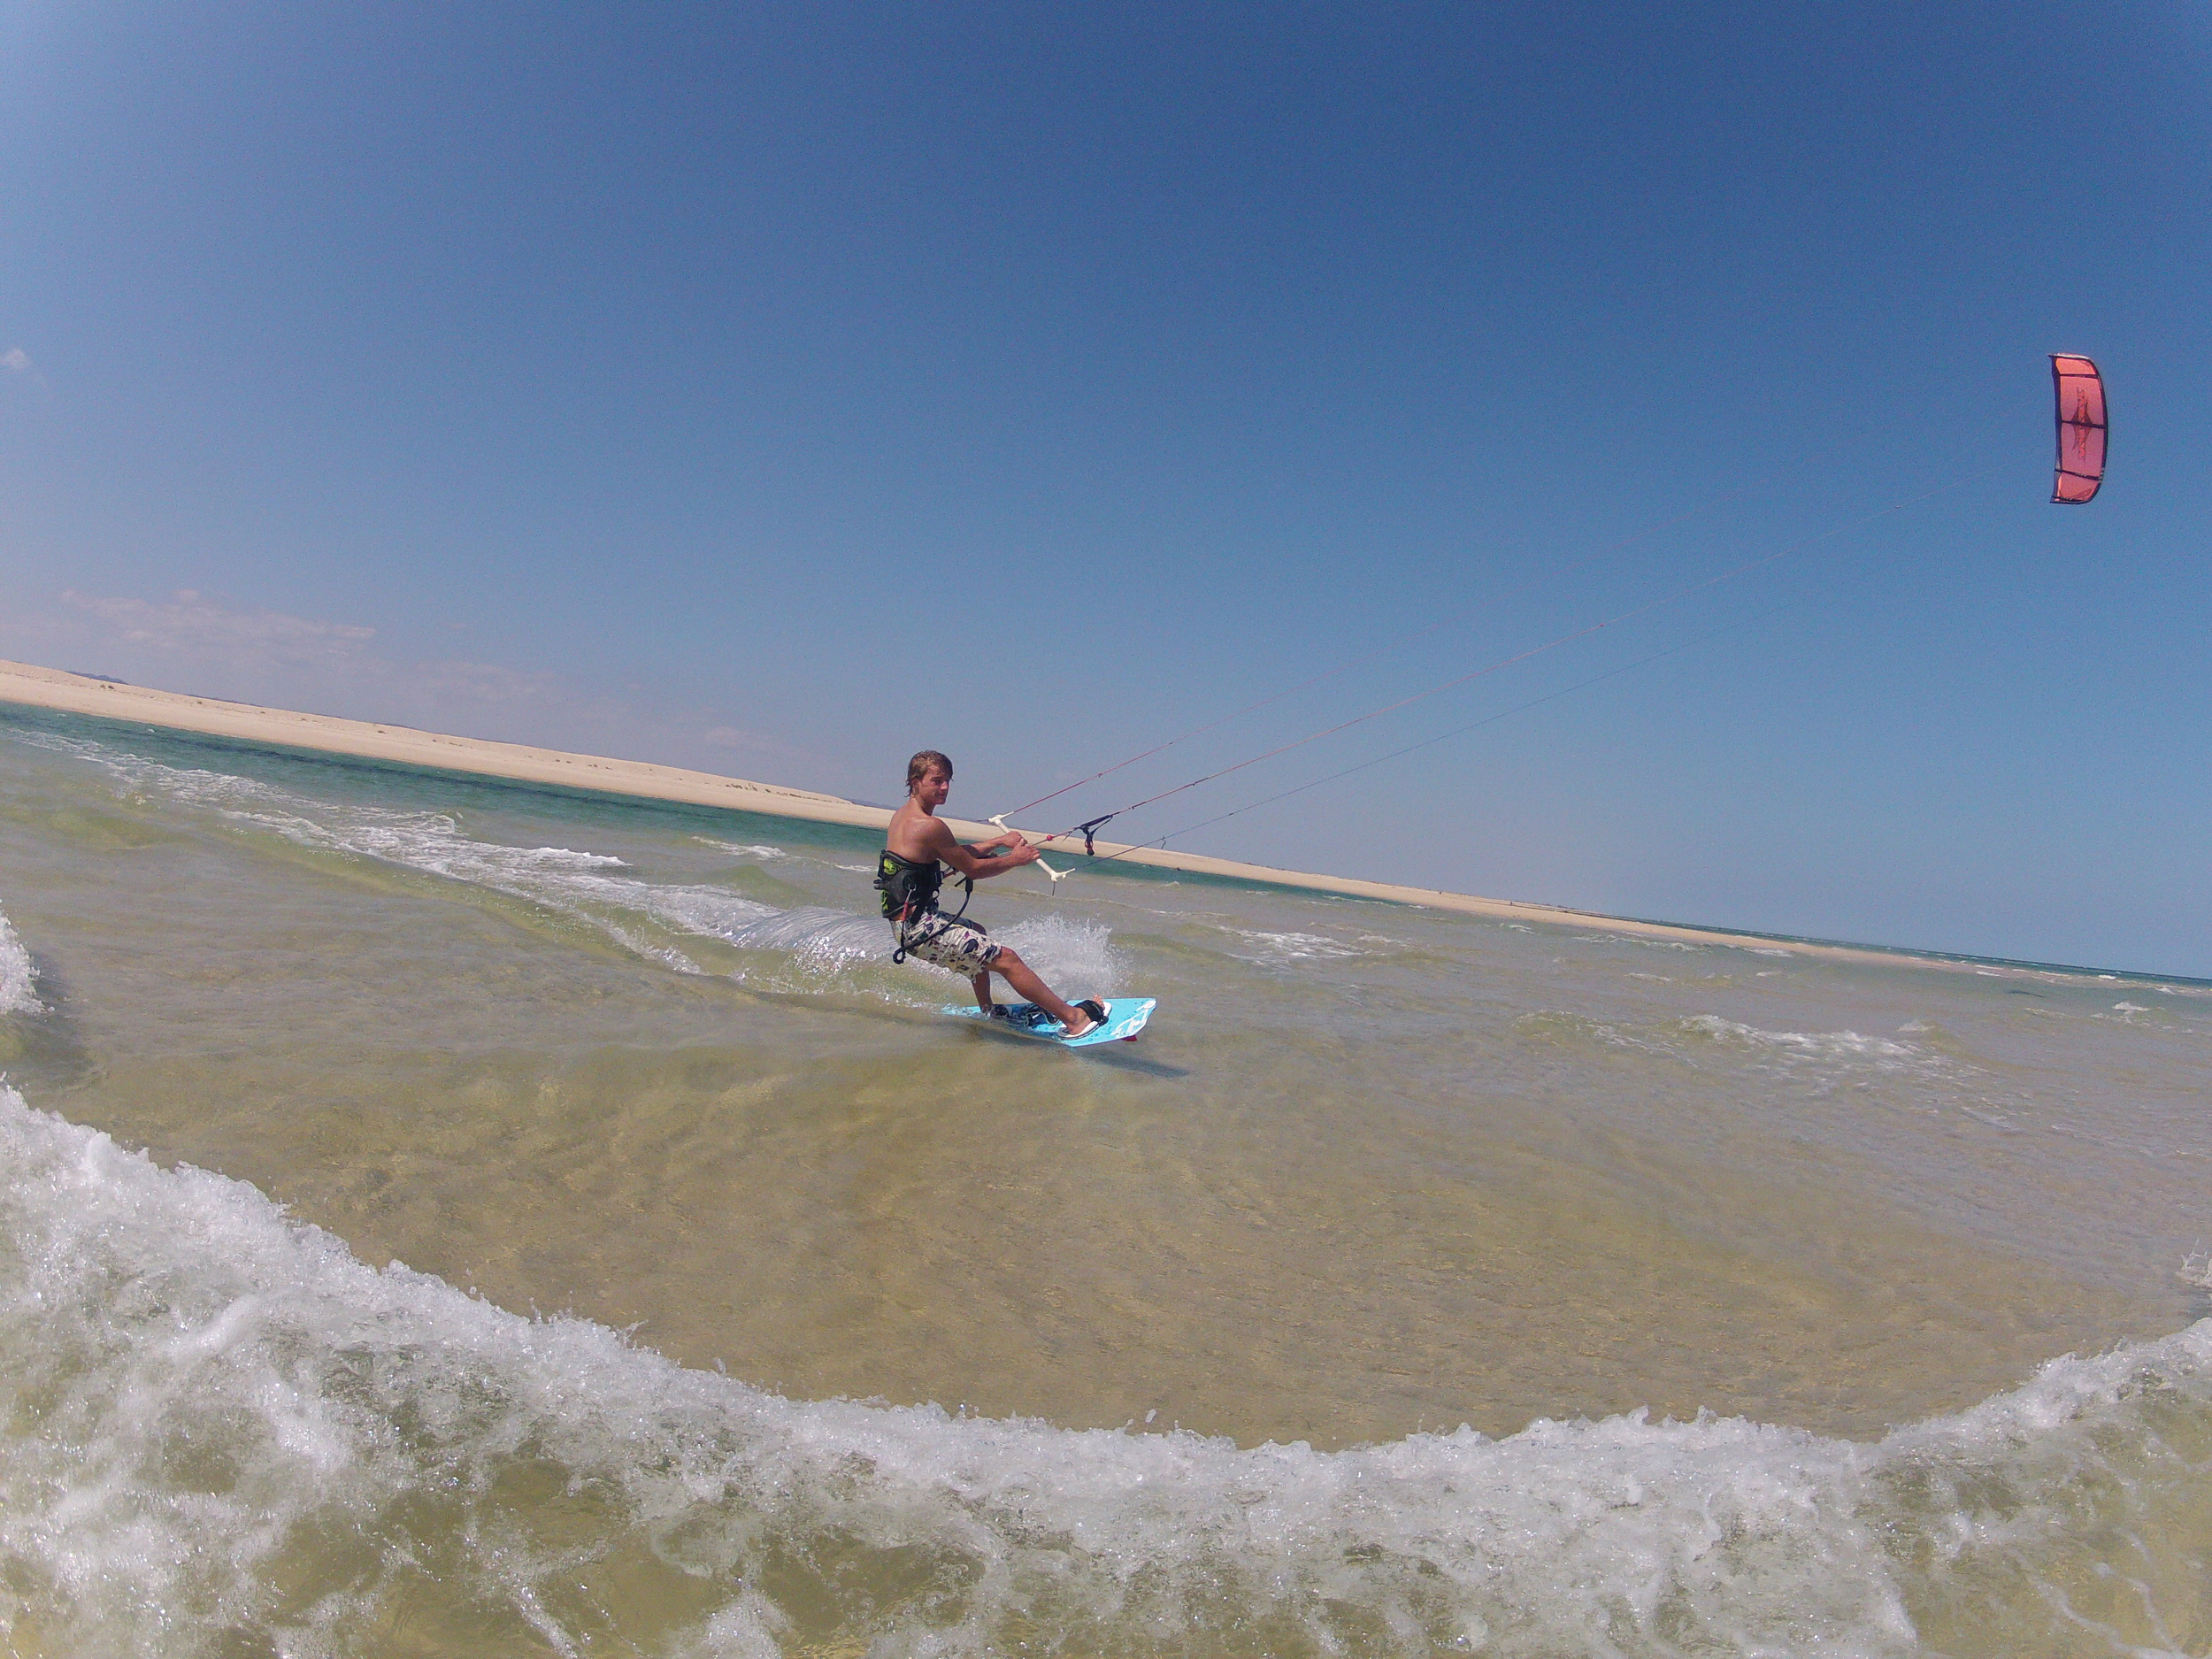 Kitesurfing in clear, clean water - Fuzeta Beach